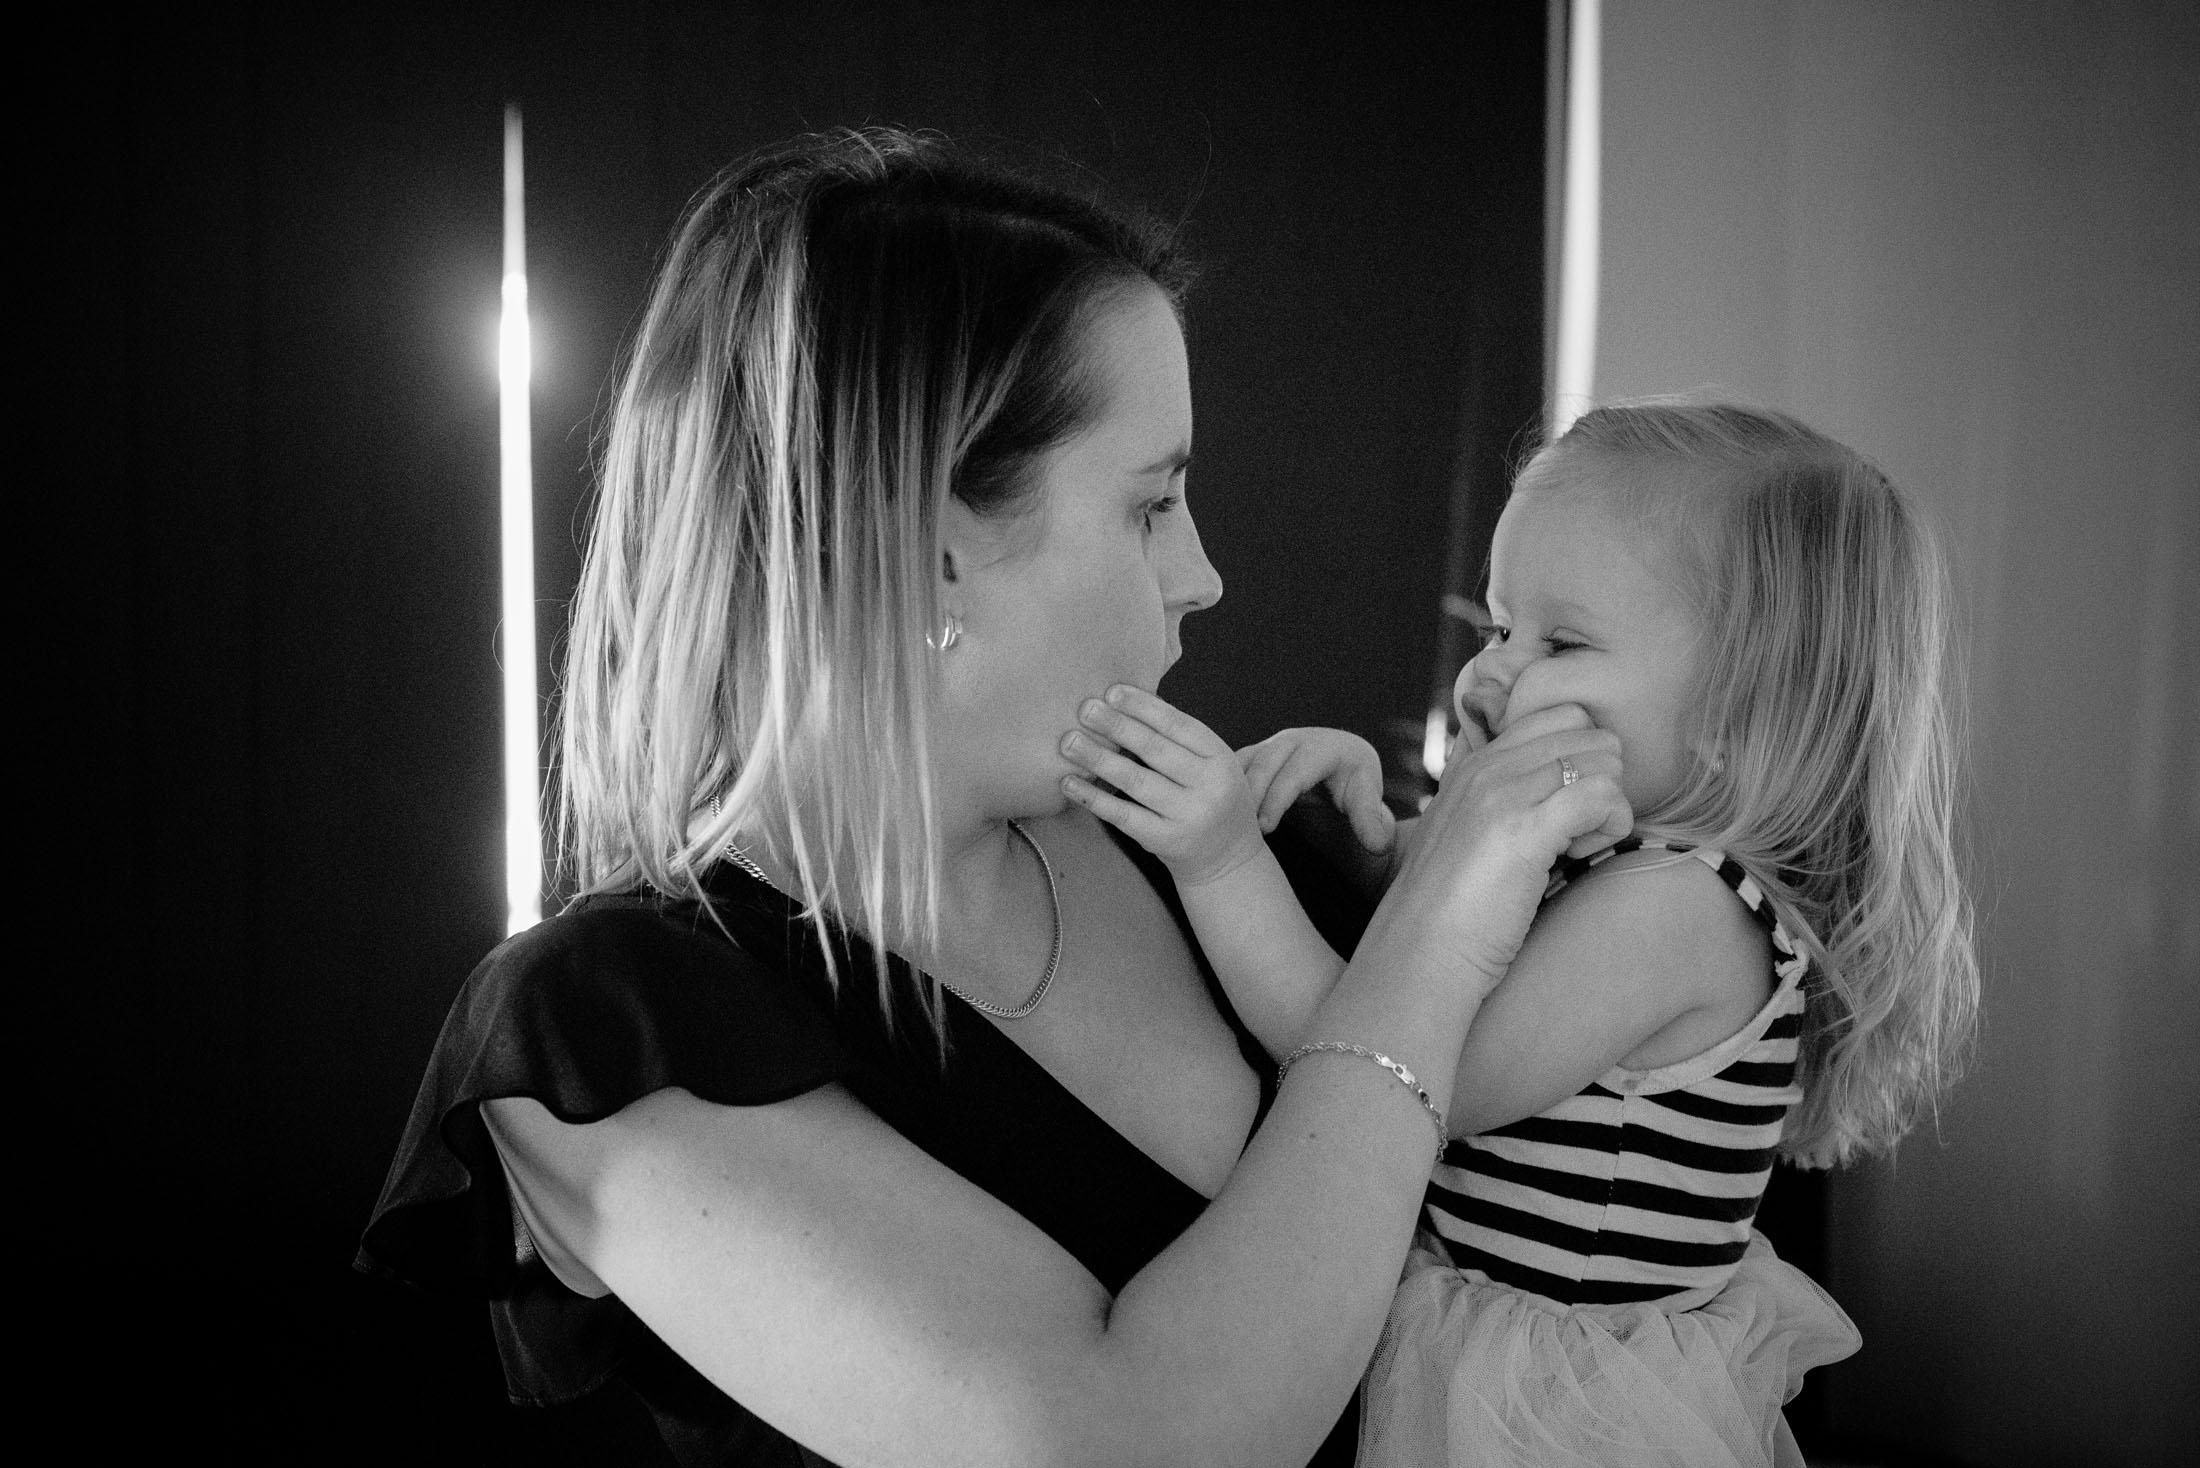 Sach_Family-Photography-unposed18.JPG